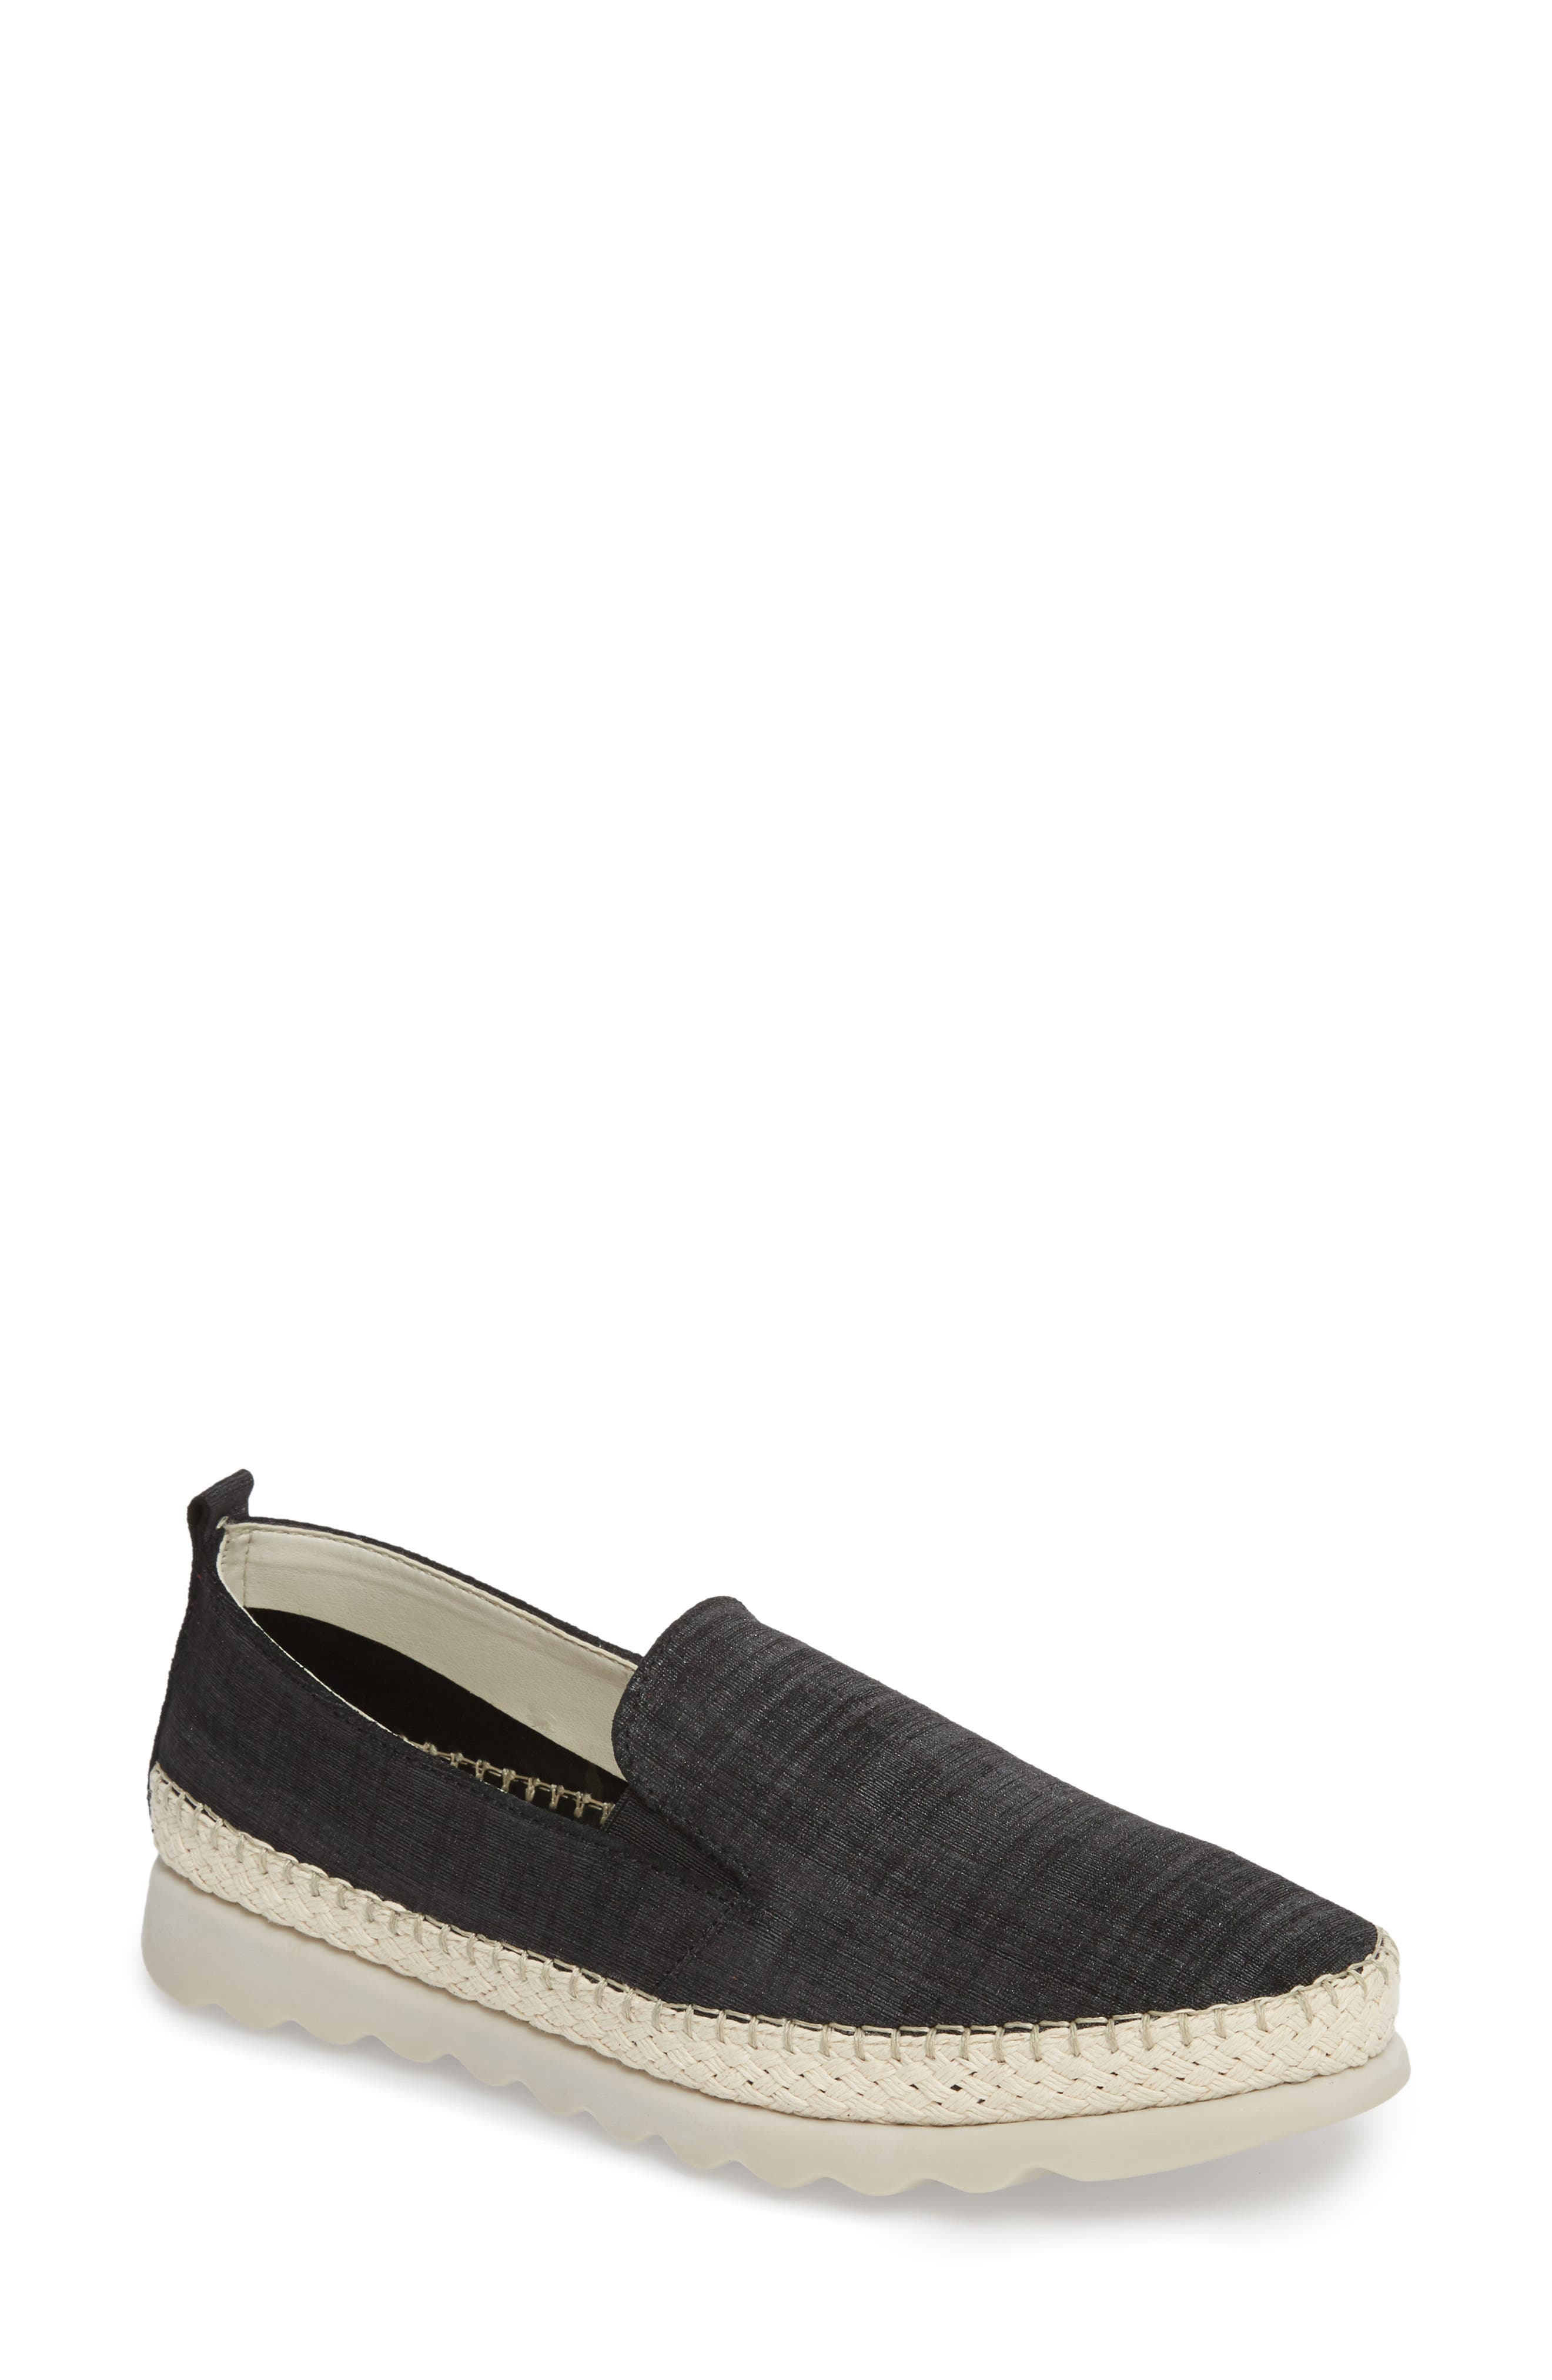 Chappie Slip-On Sneaker,                         Main,                         color,